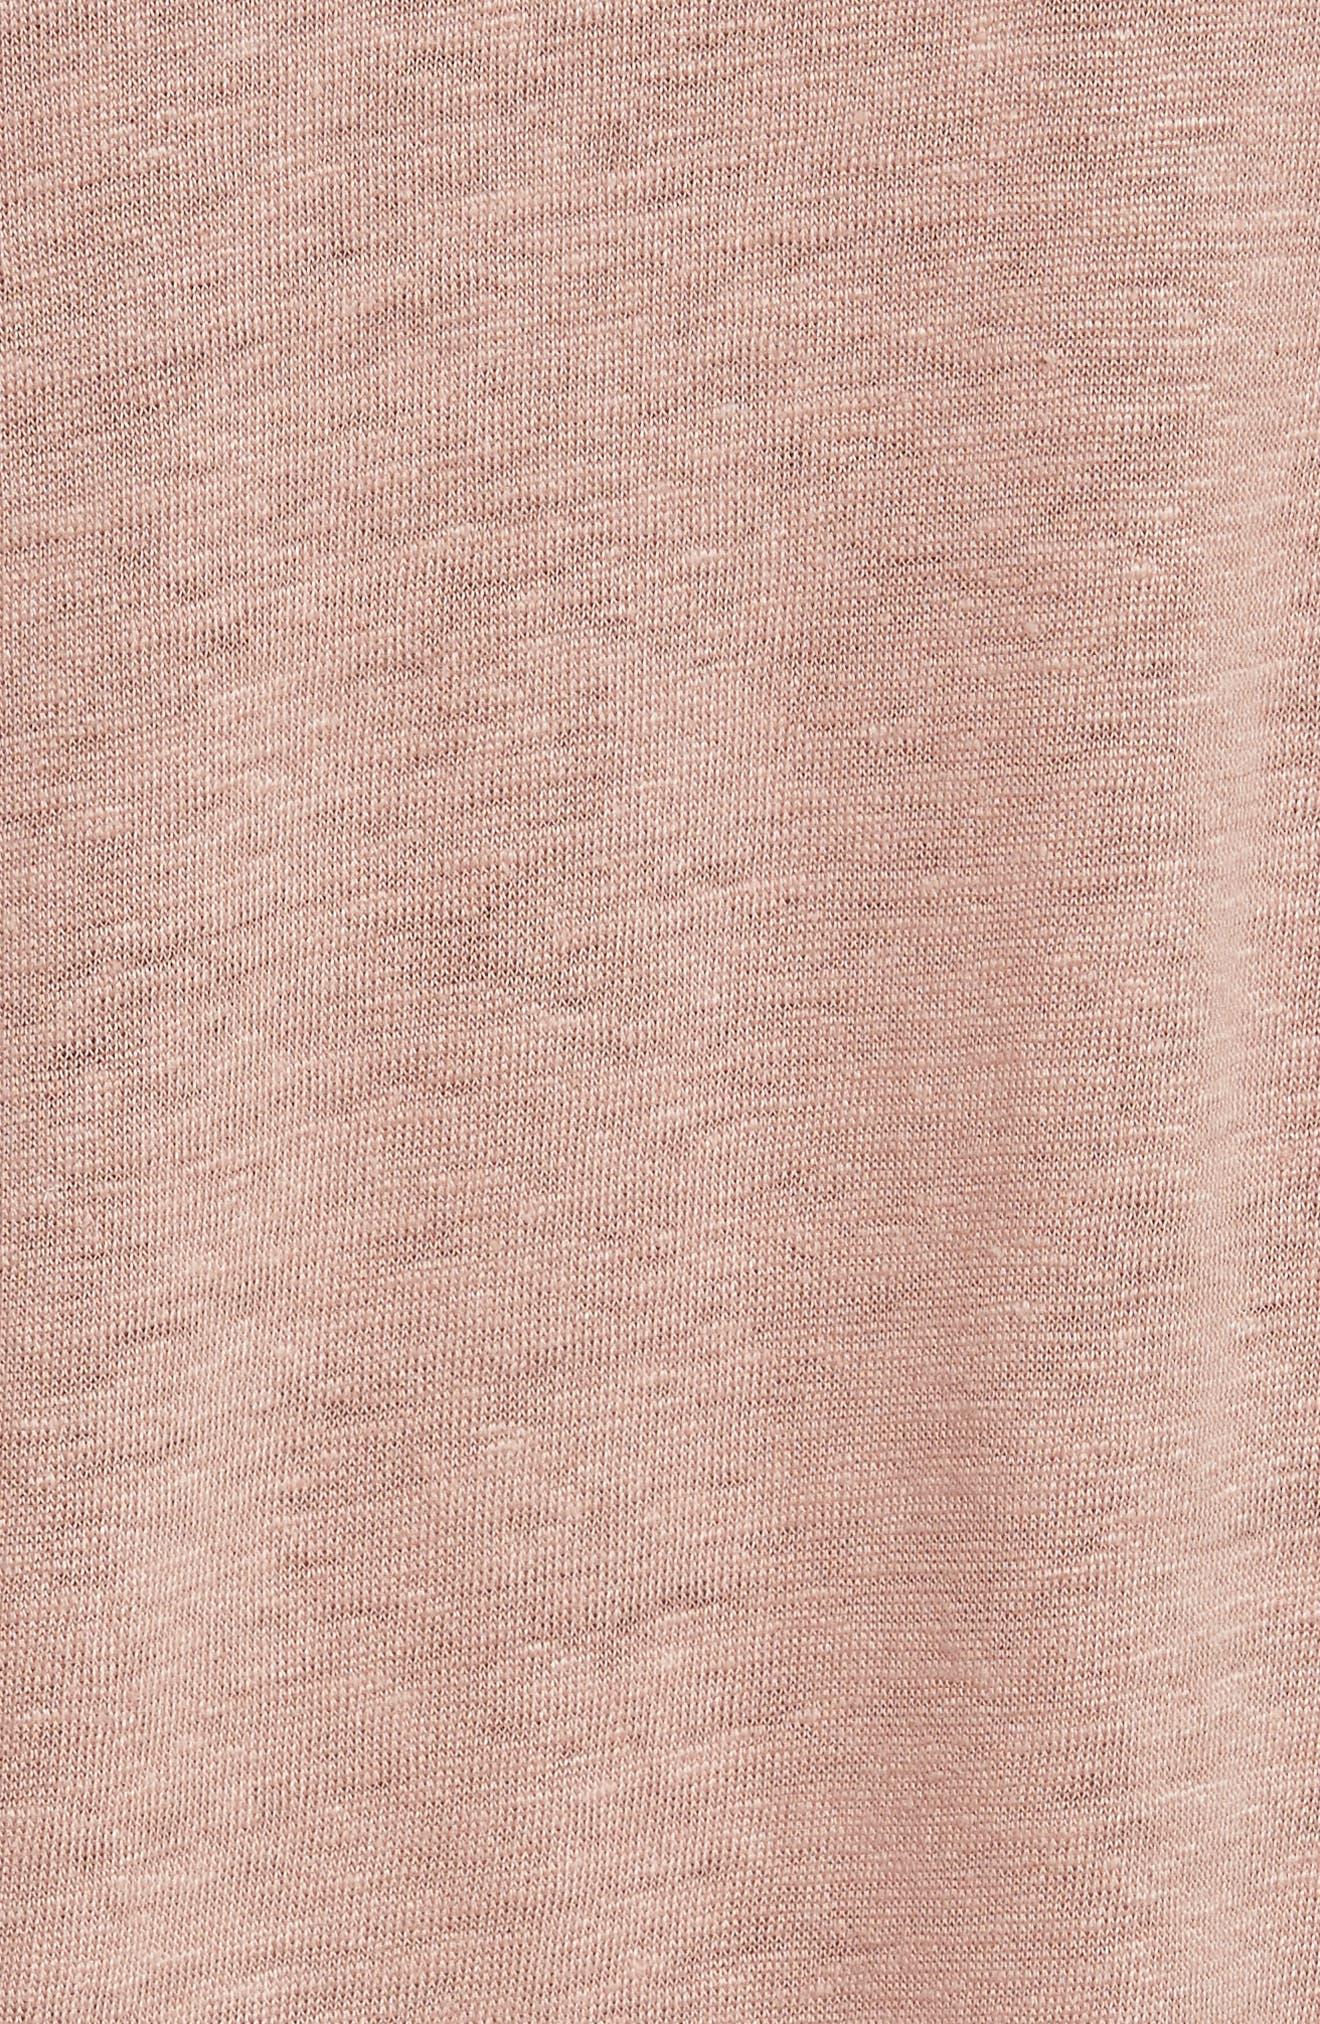 Bacau Cold Shoulder Linen Tee,                             Alternate thumbnail 5, color,                             Old Pink